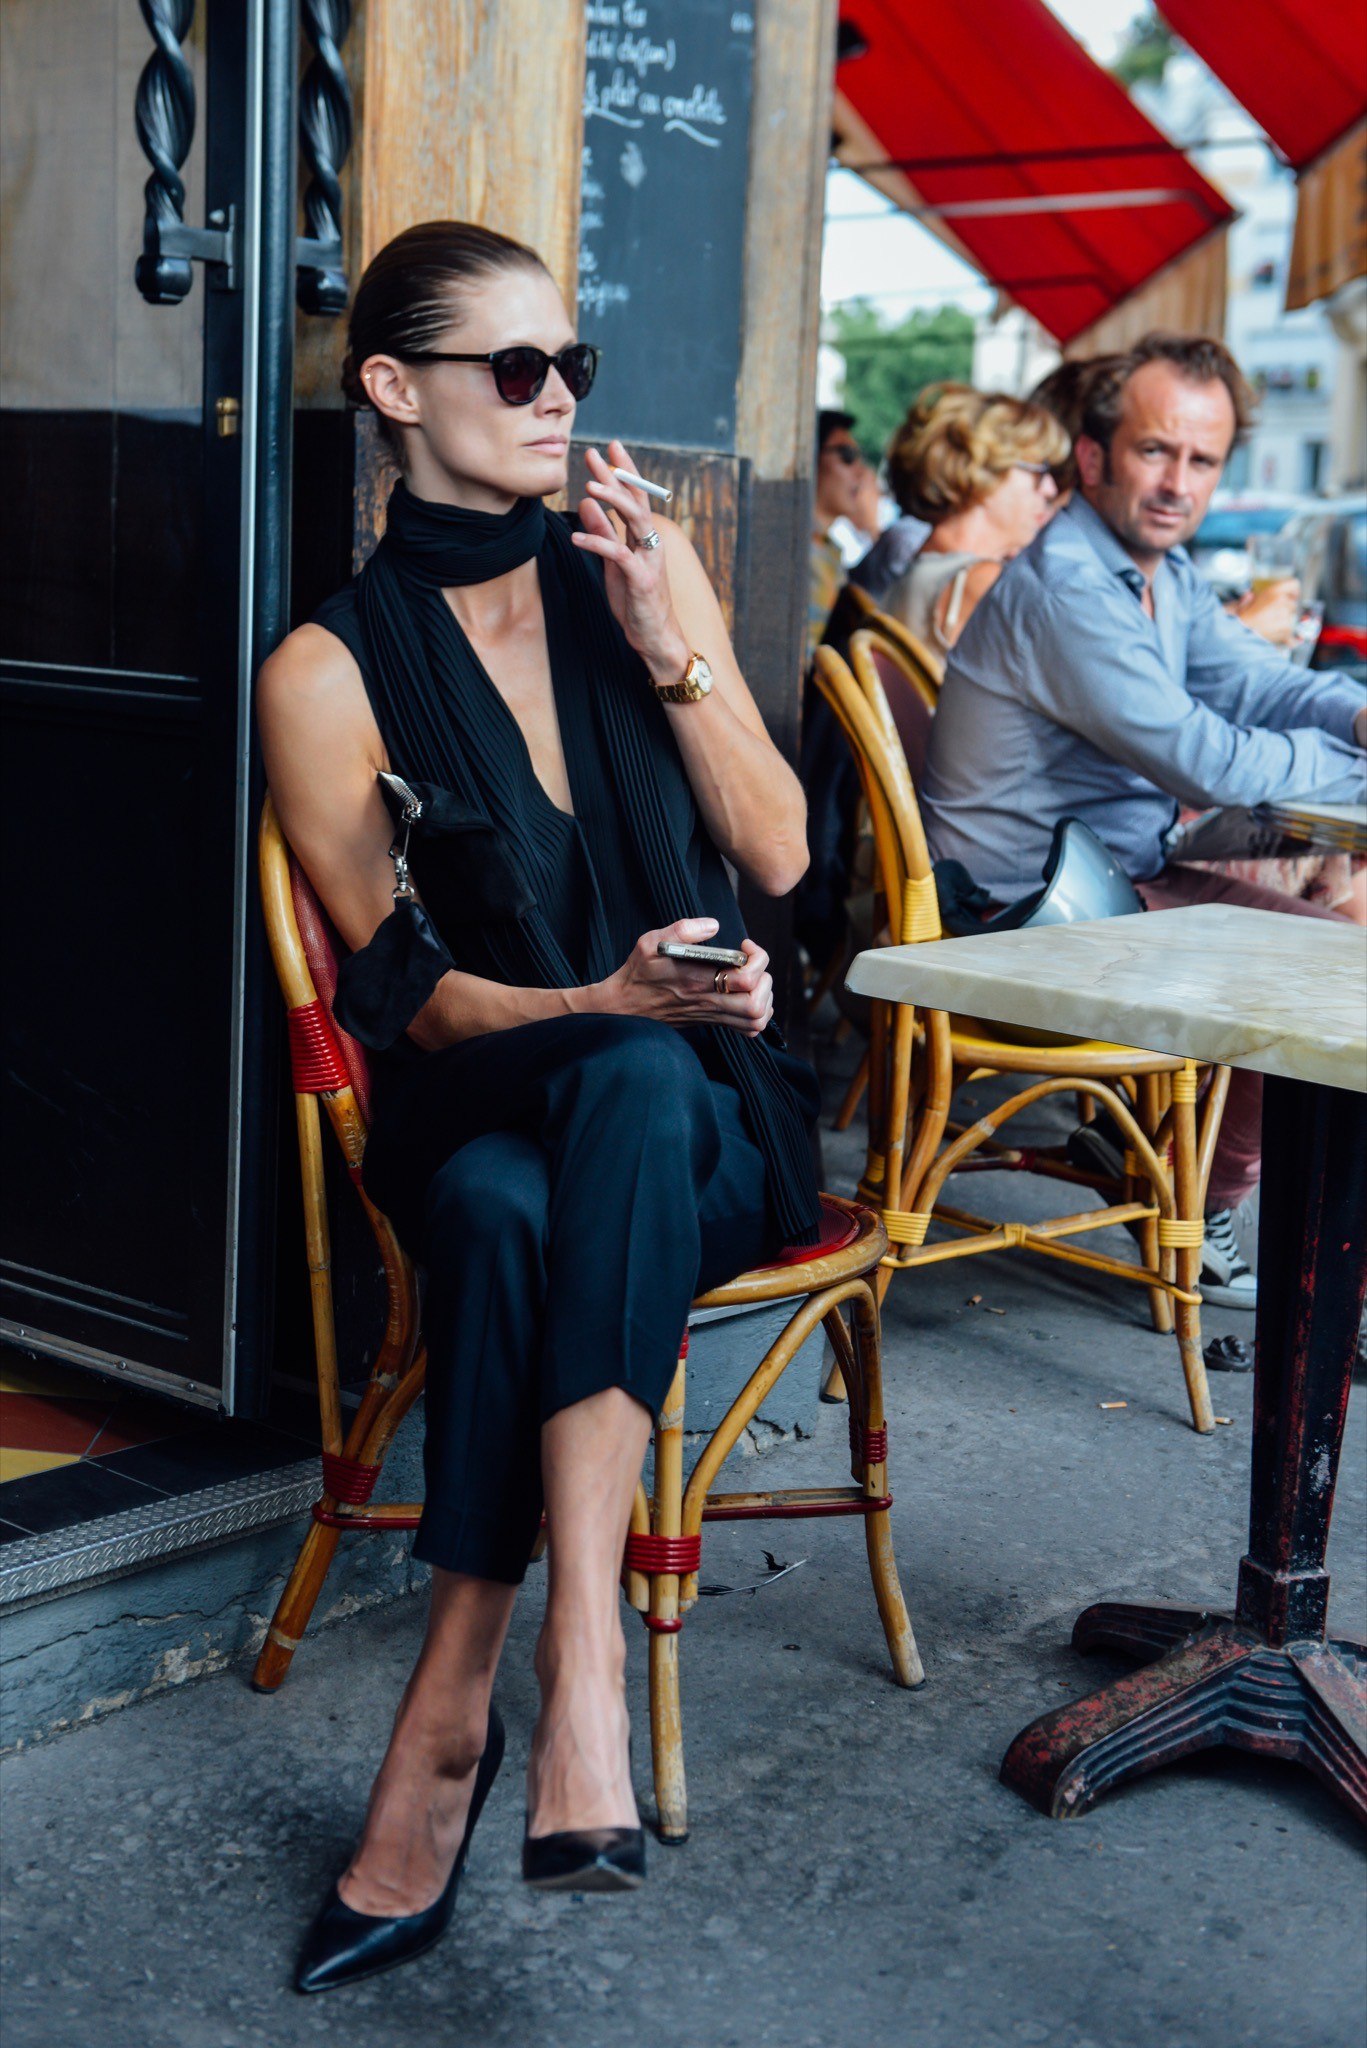 18-spring-2016-menswear-street-style-02.jpg